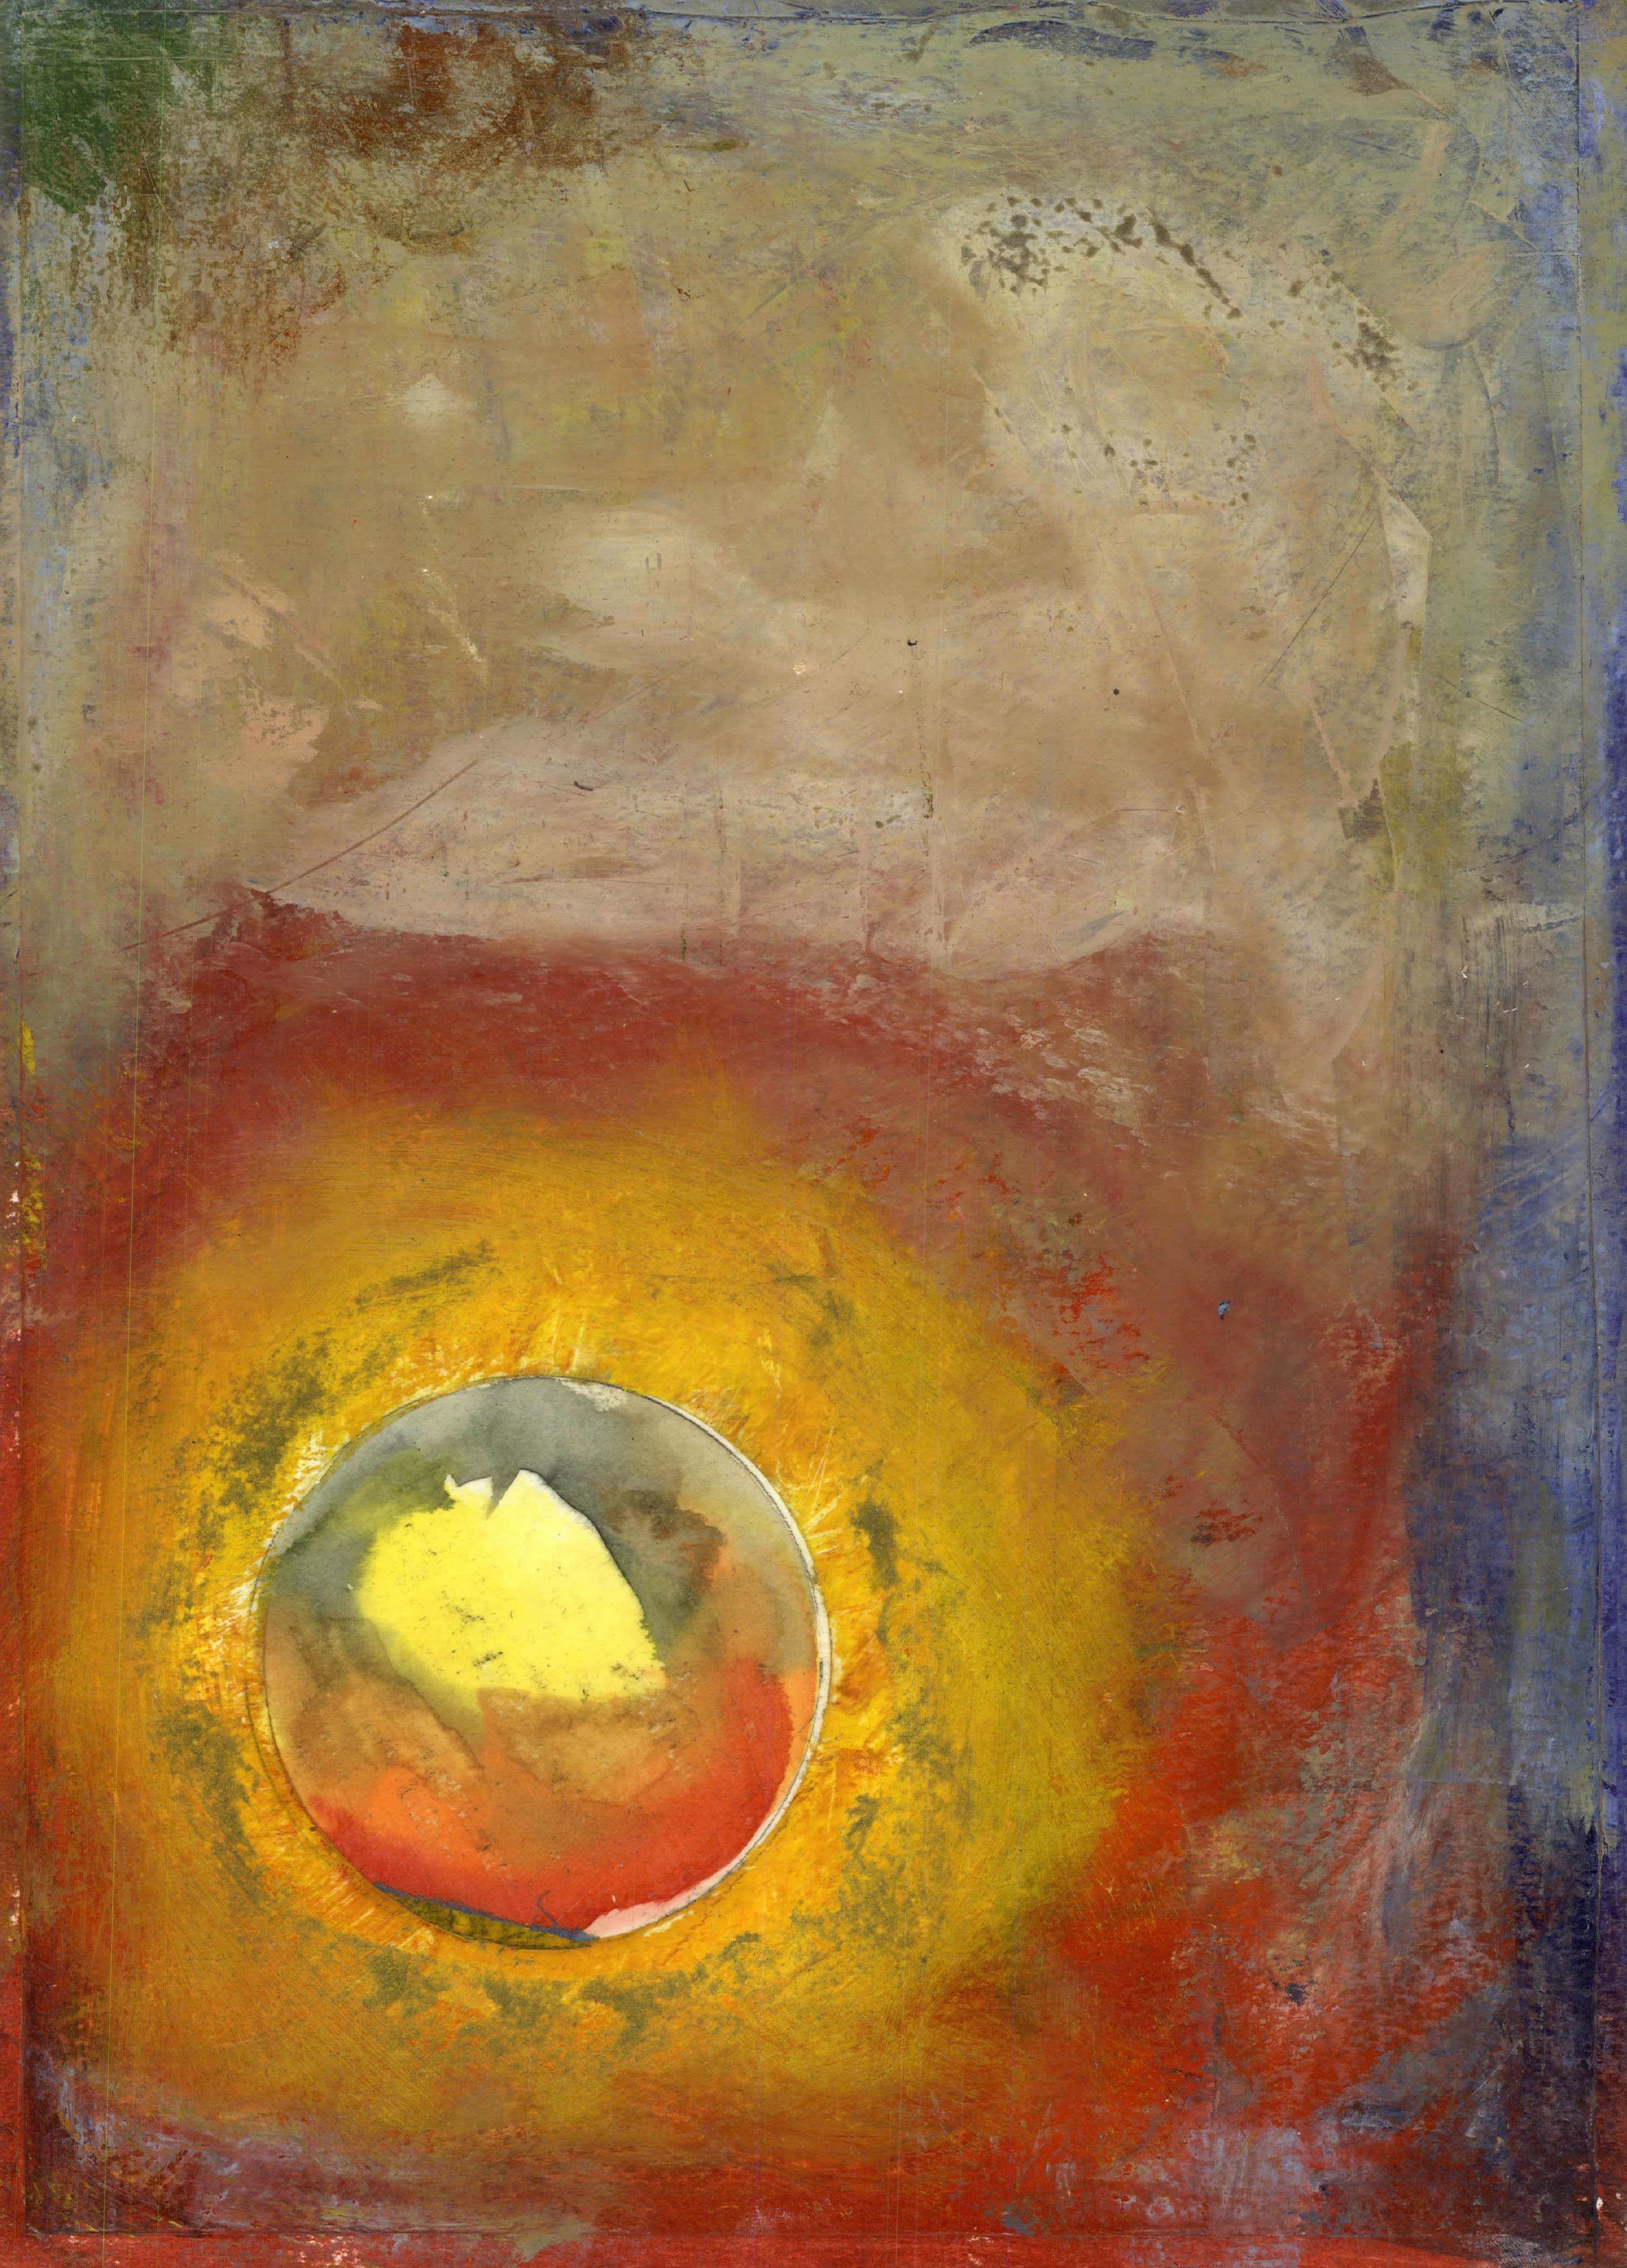 Ecliptic Meditations XIII